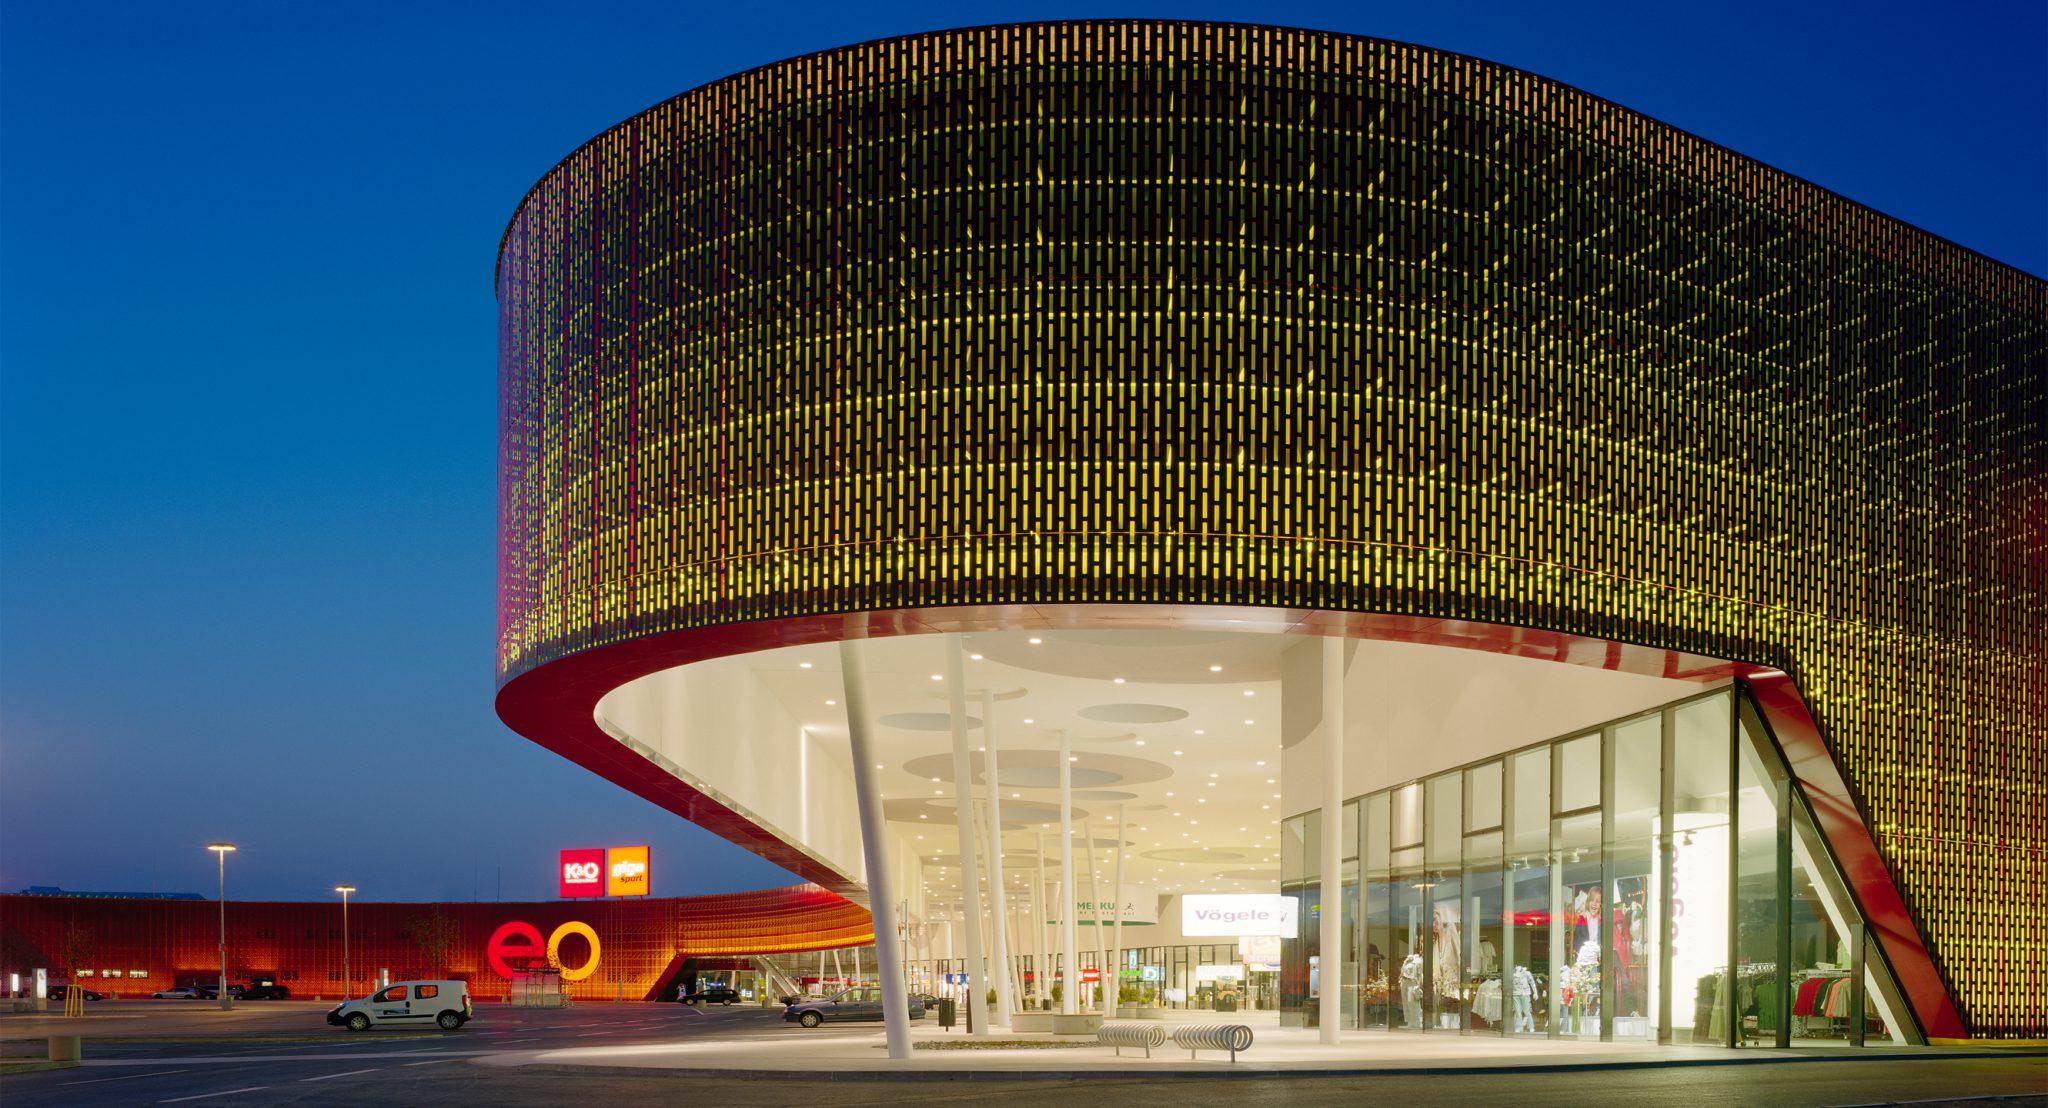 Shopping Mall EO in Oberwart: Austria's First Power Centre